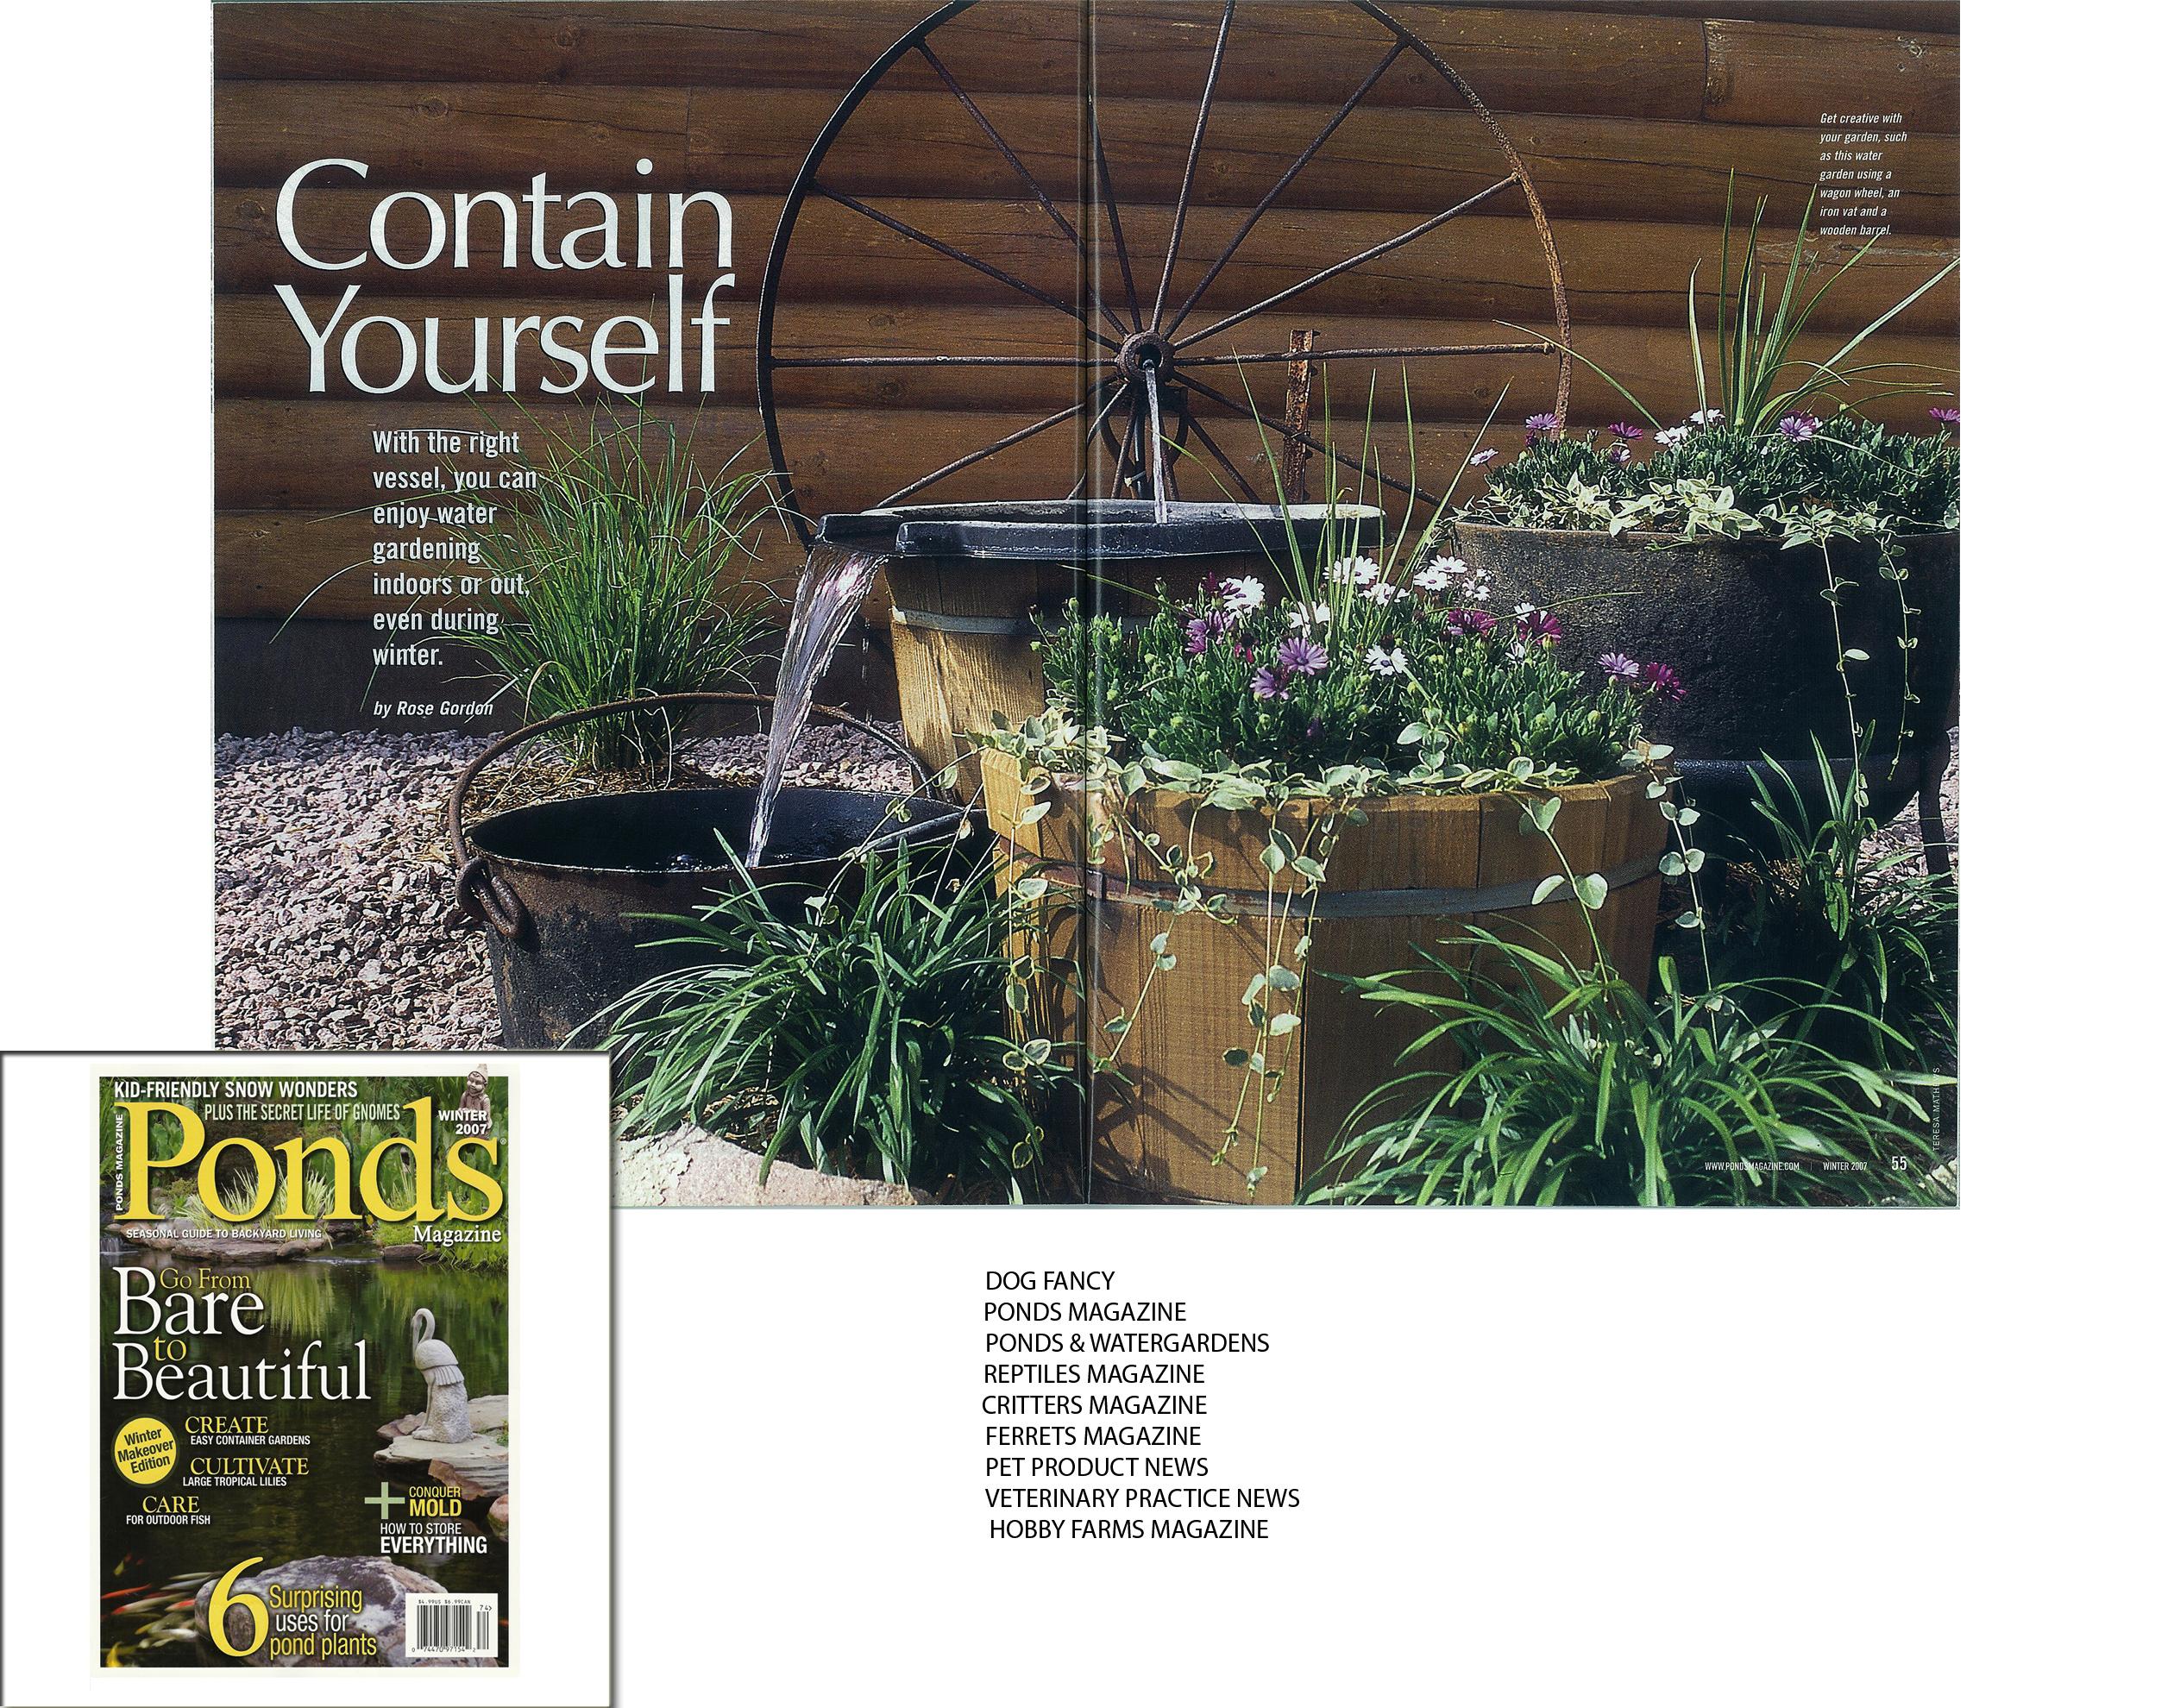 Ponds Magazine 2-page spread